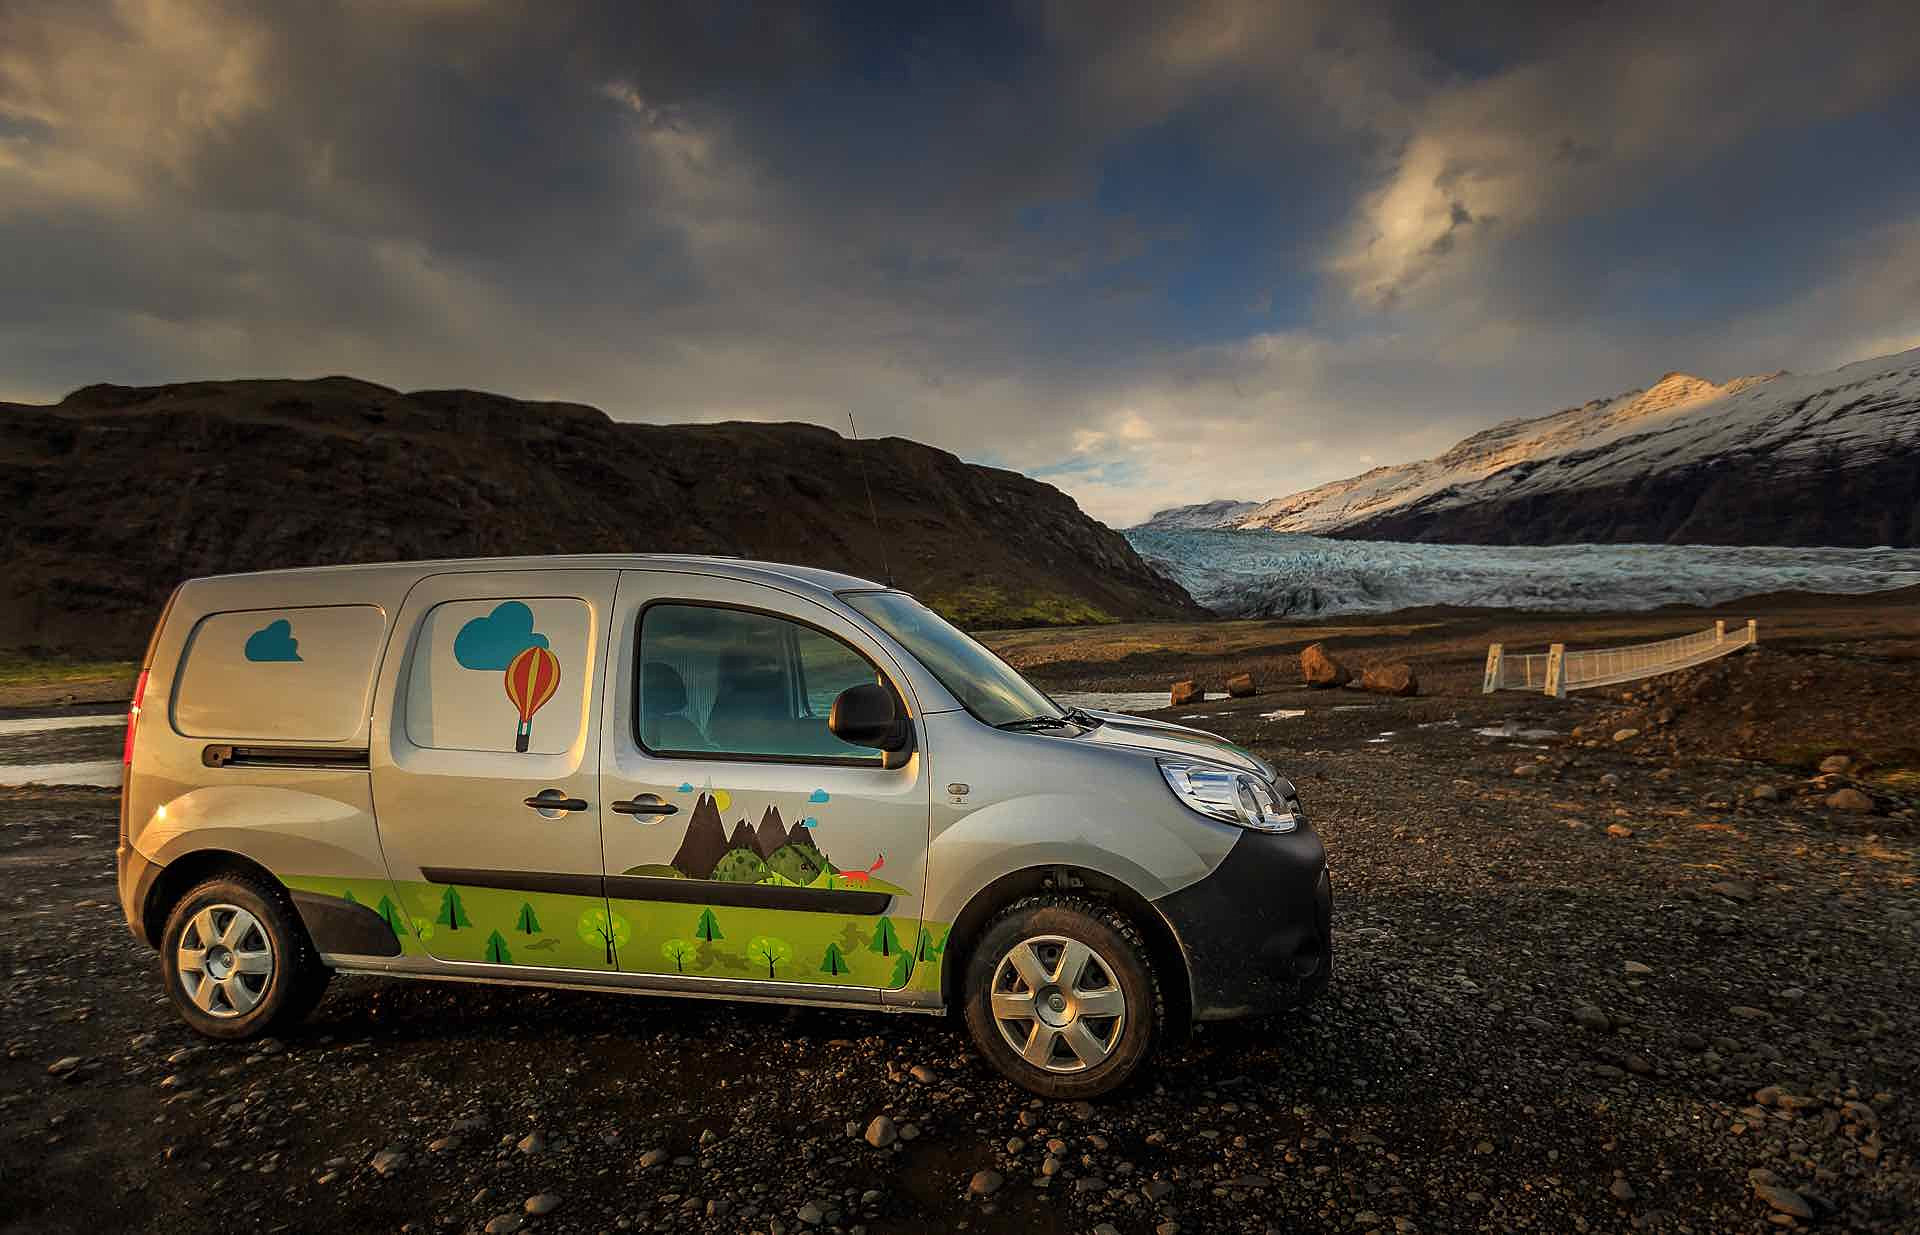 location de camping car en islande camping car en islande location camping car islande. Black Bedroom Furniture Sets. Home Design Ideas